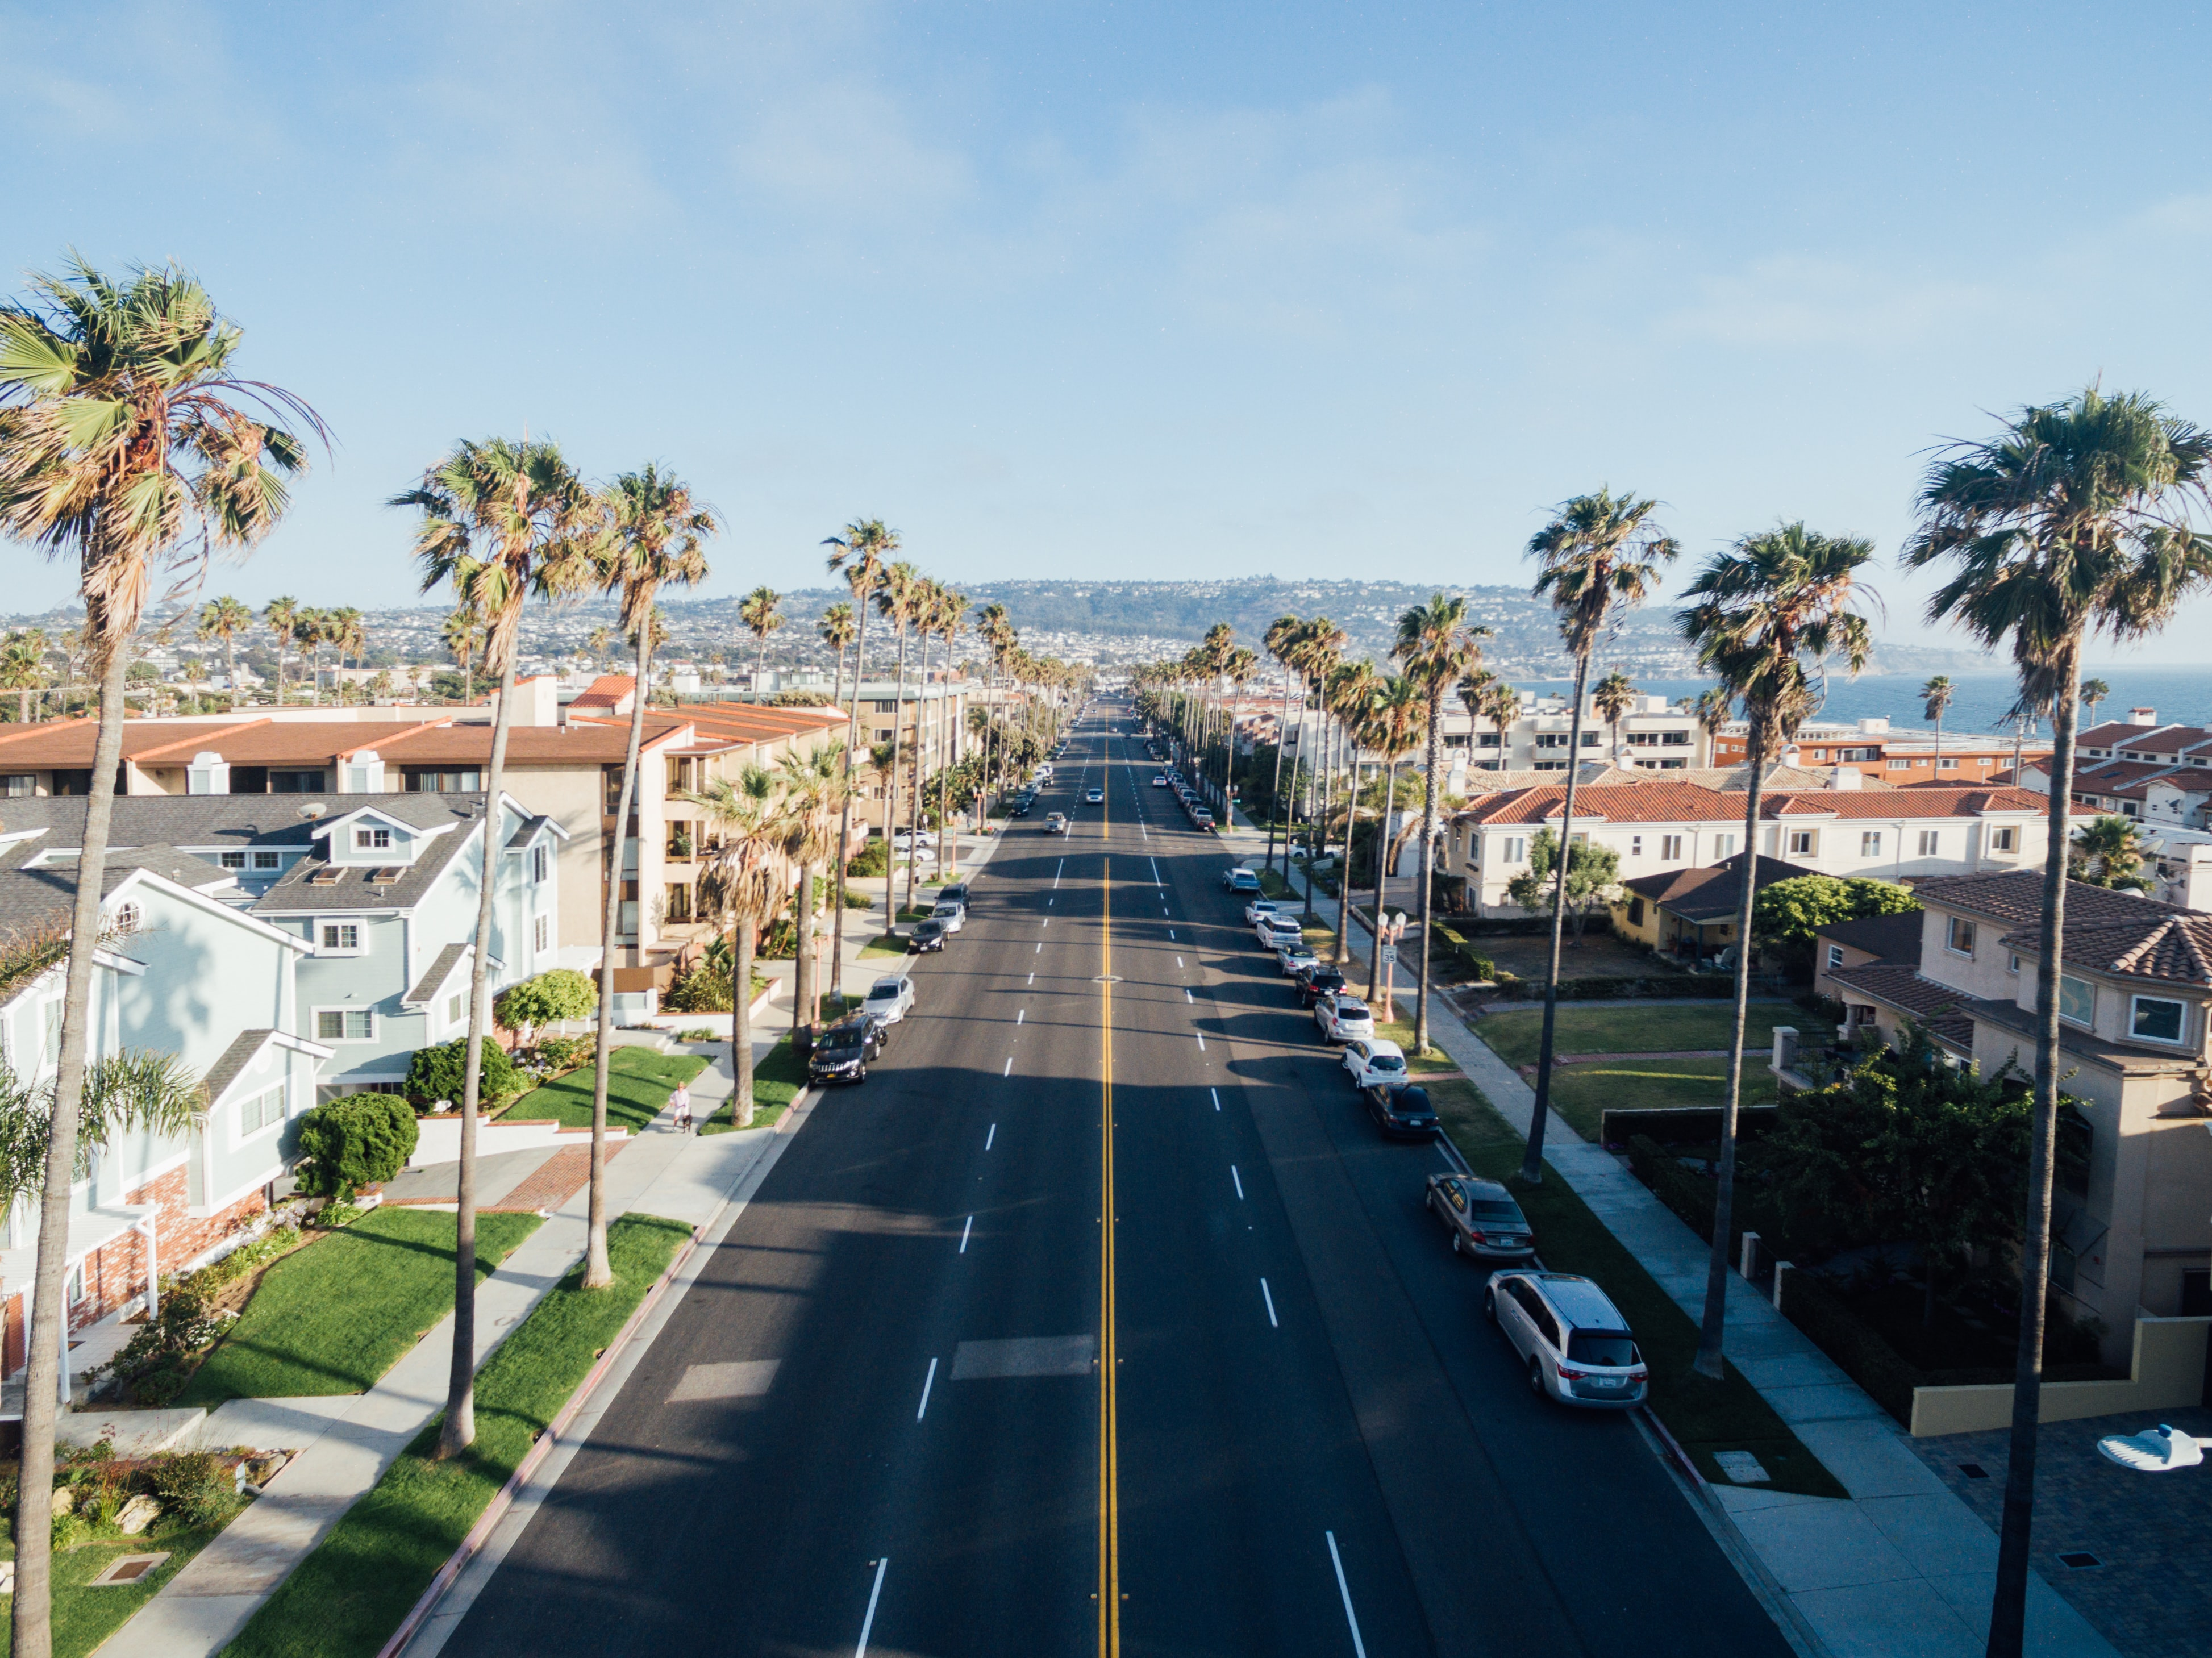 biking in Santa Barbara